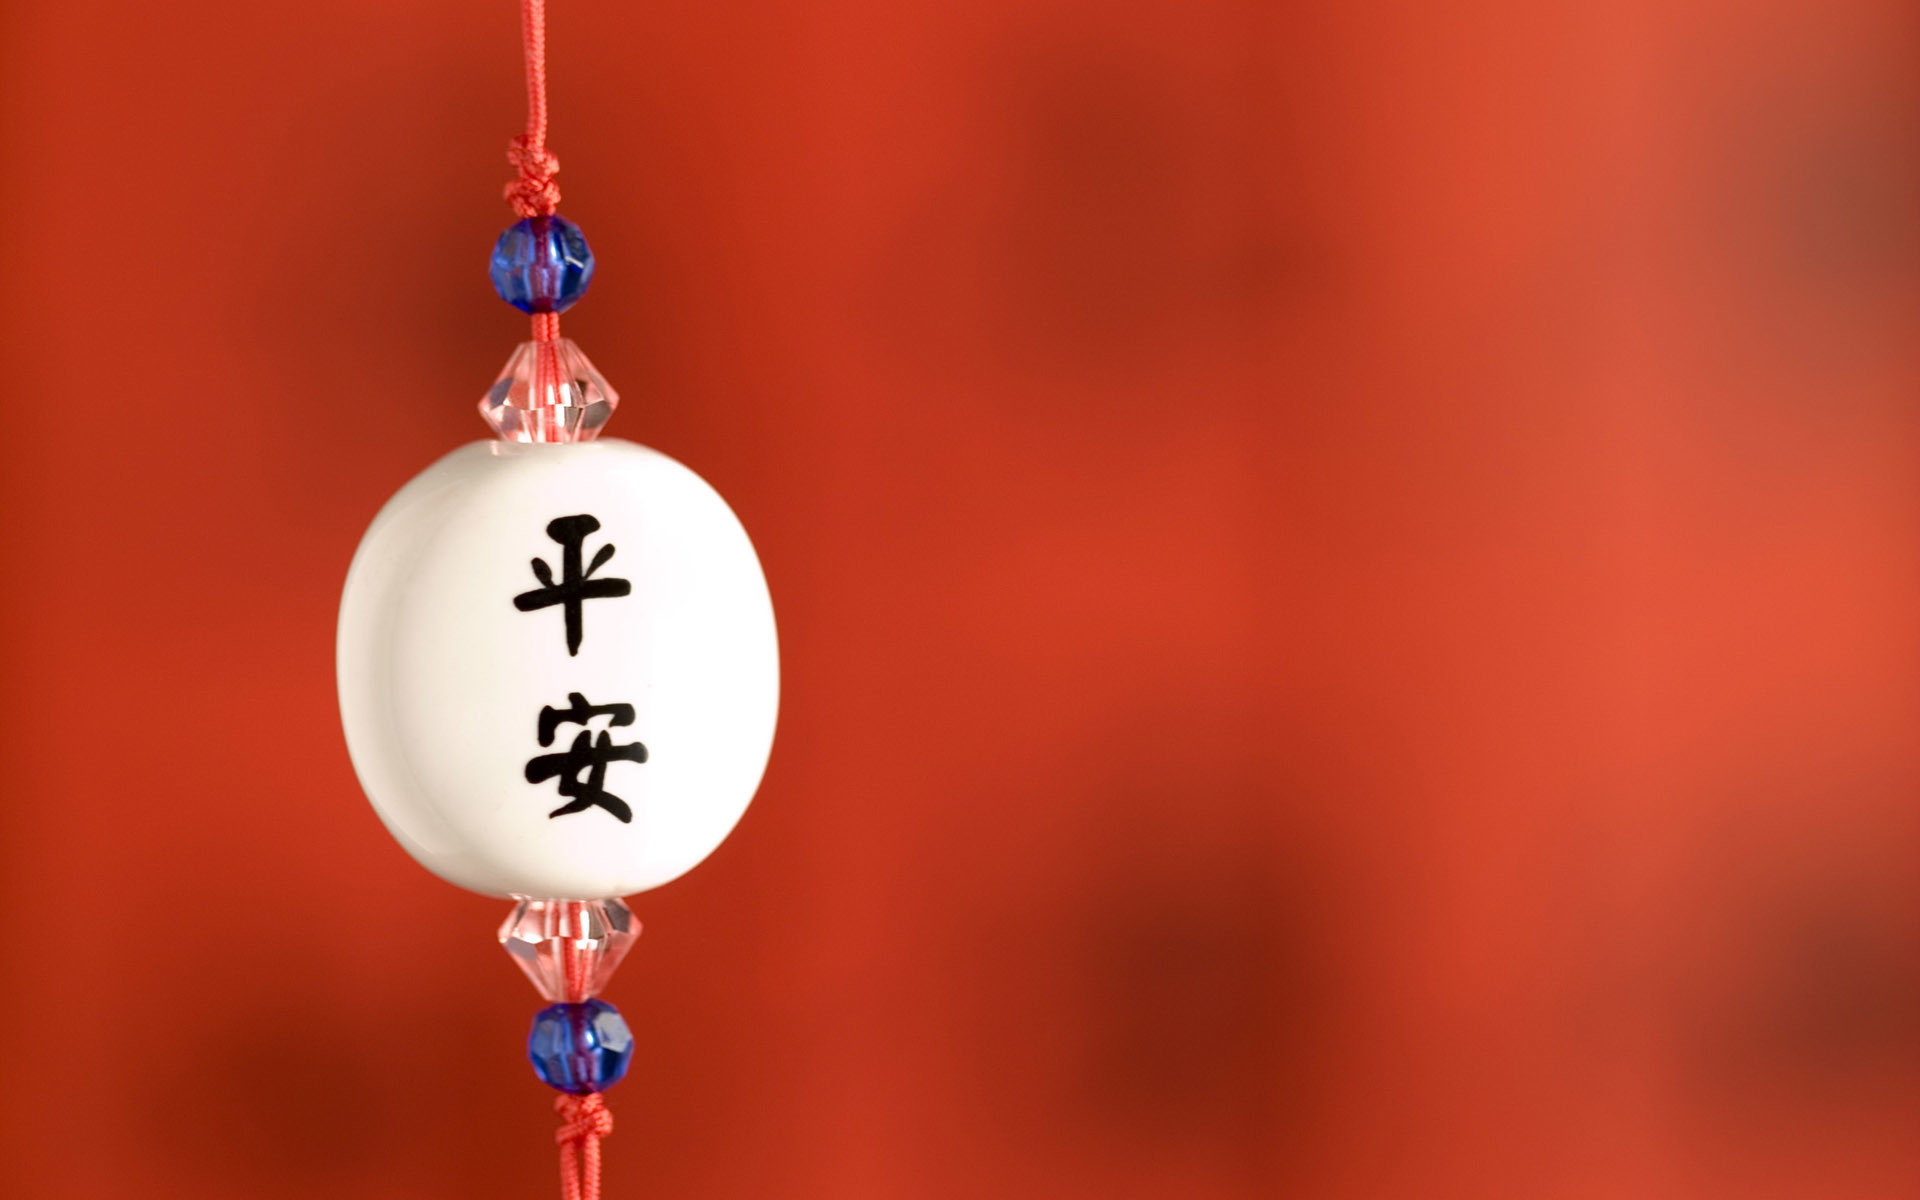 Hanging Lamp Chinese new year Image